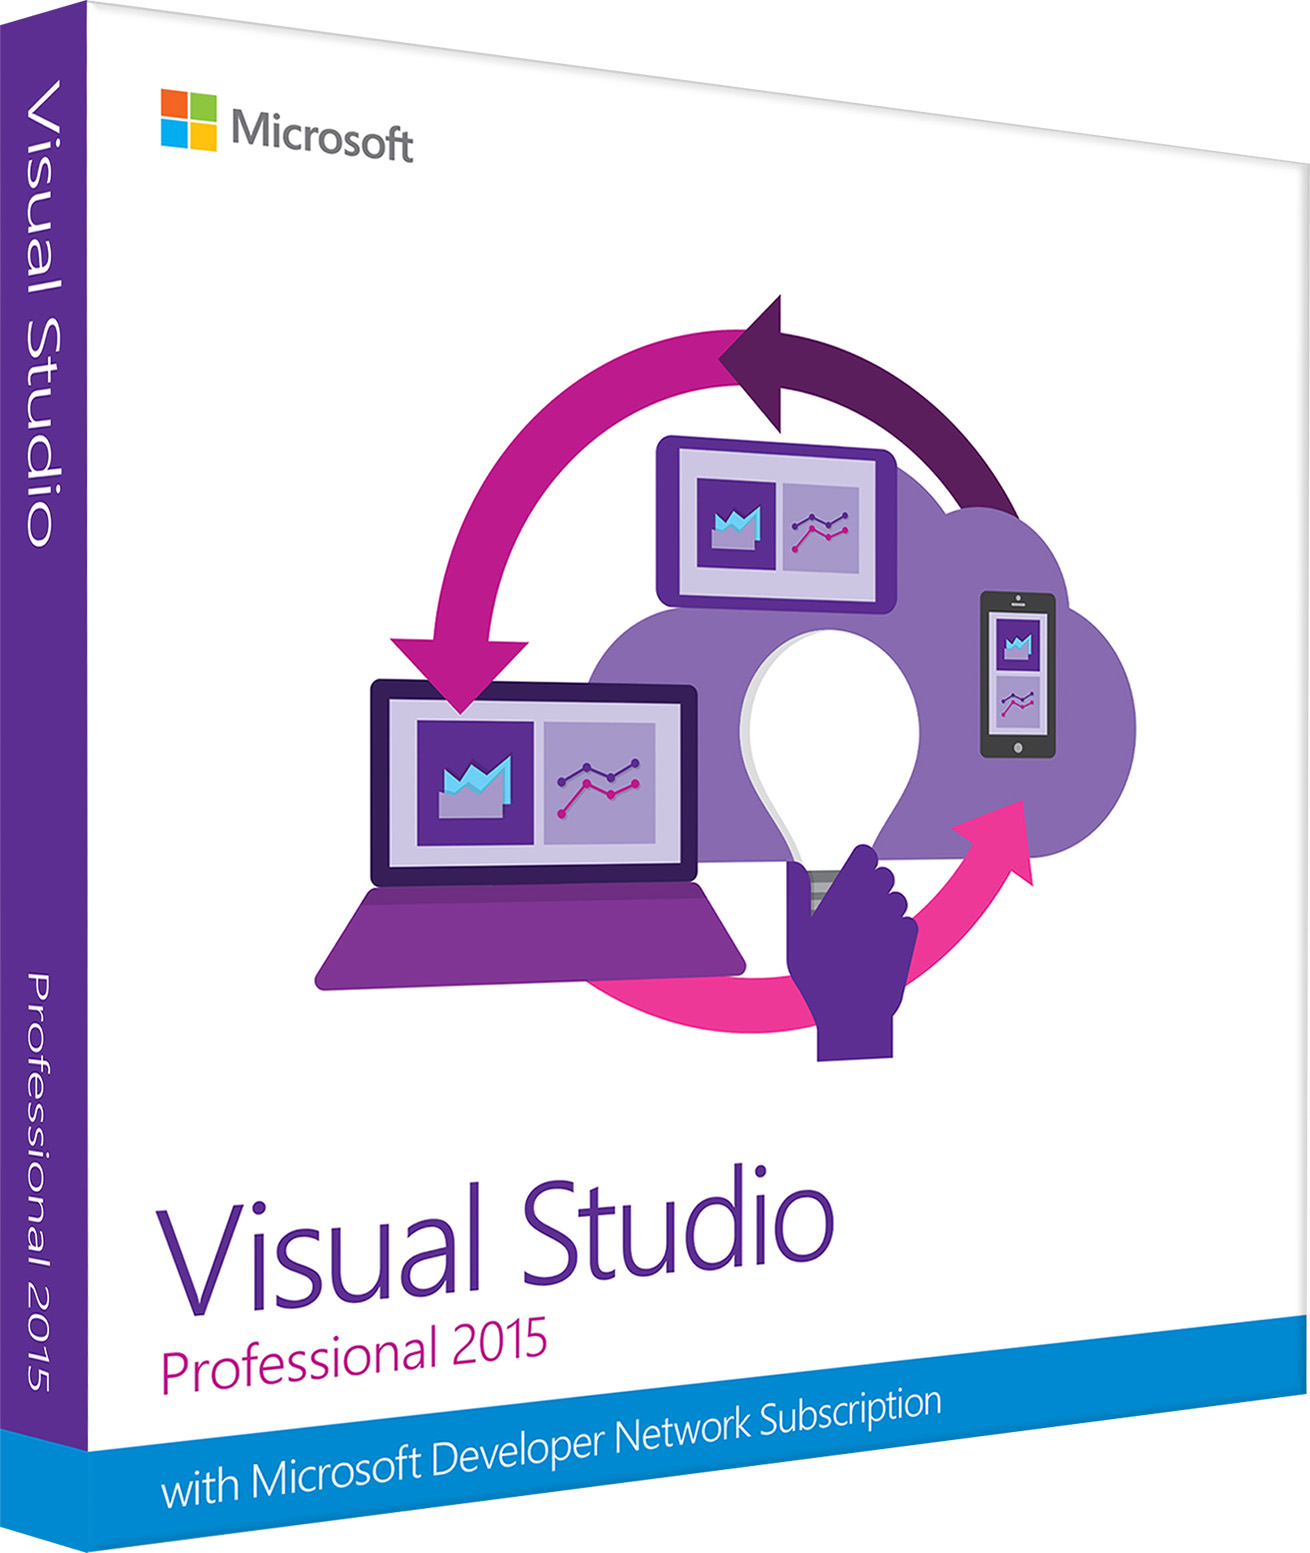 Visual Studio Professional with MSDN